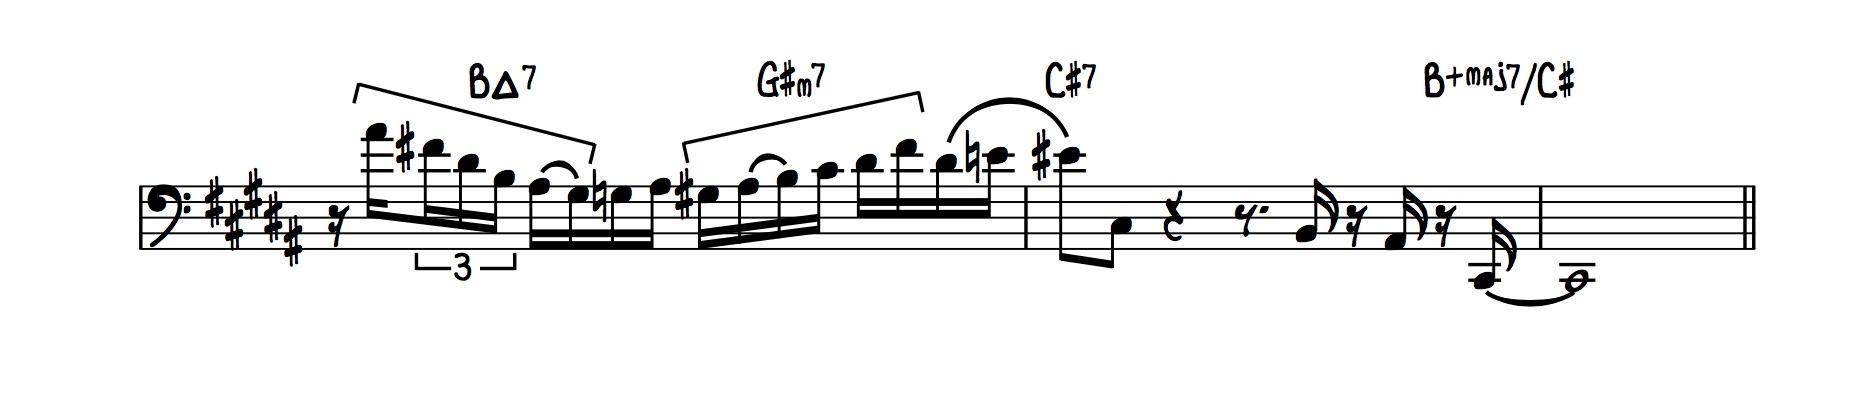 swagism chords